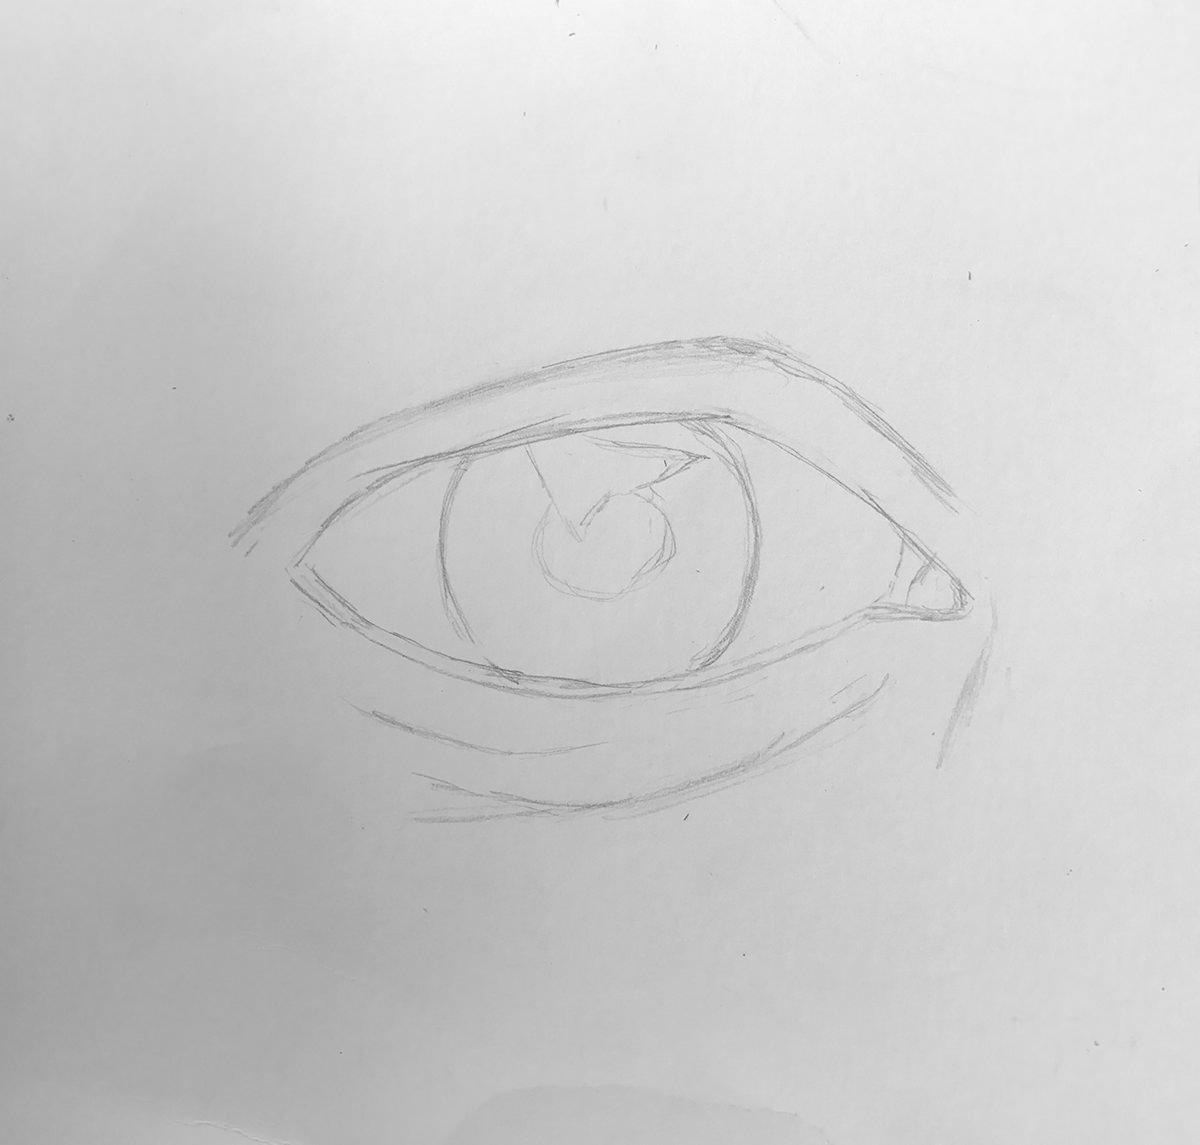 draw-a-realistic-eye-step-02-sketch-the-outline.jpg